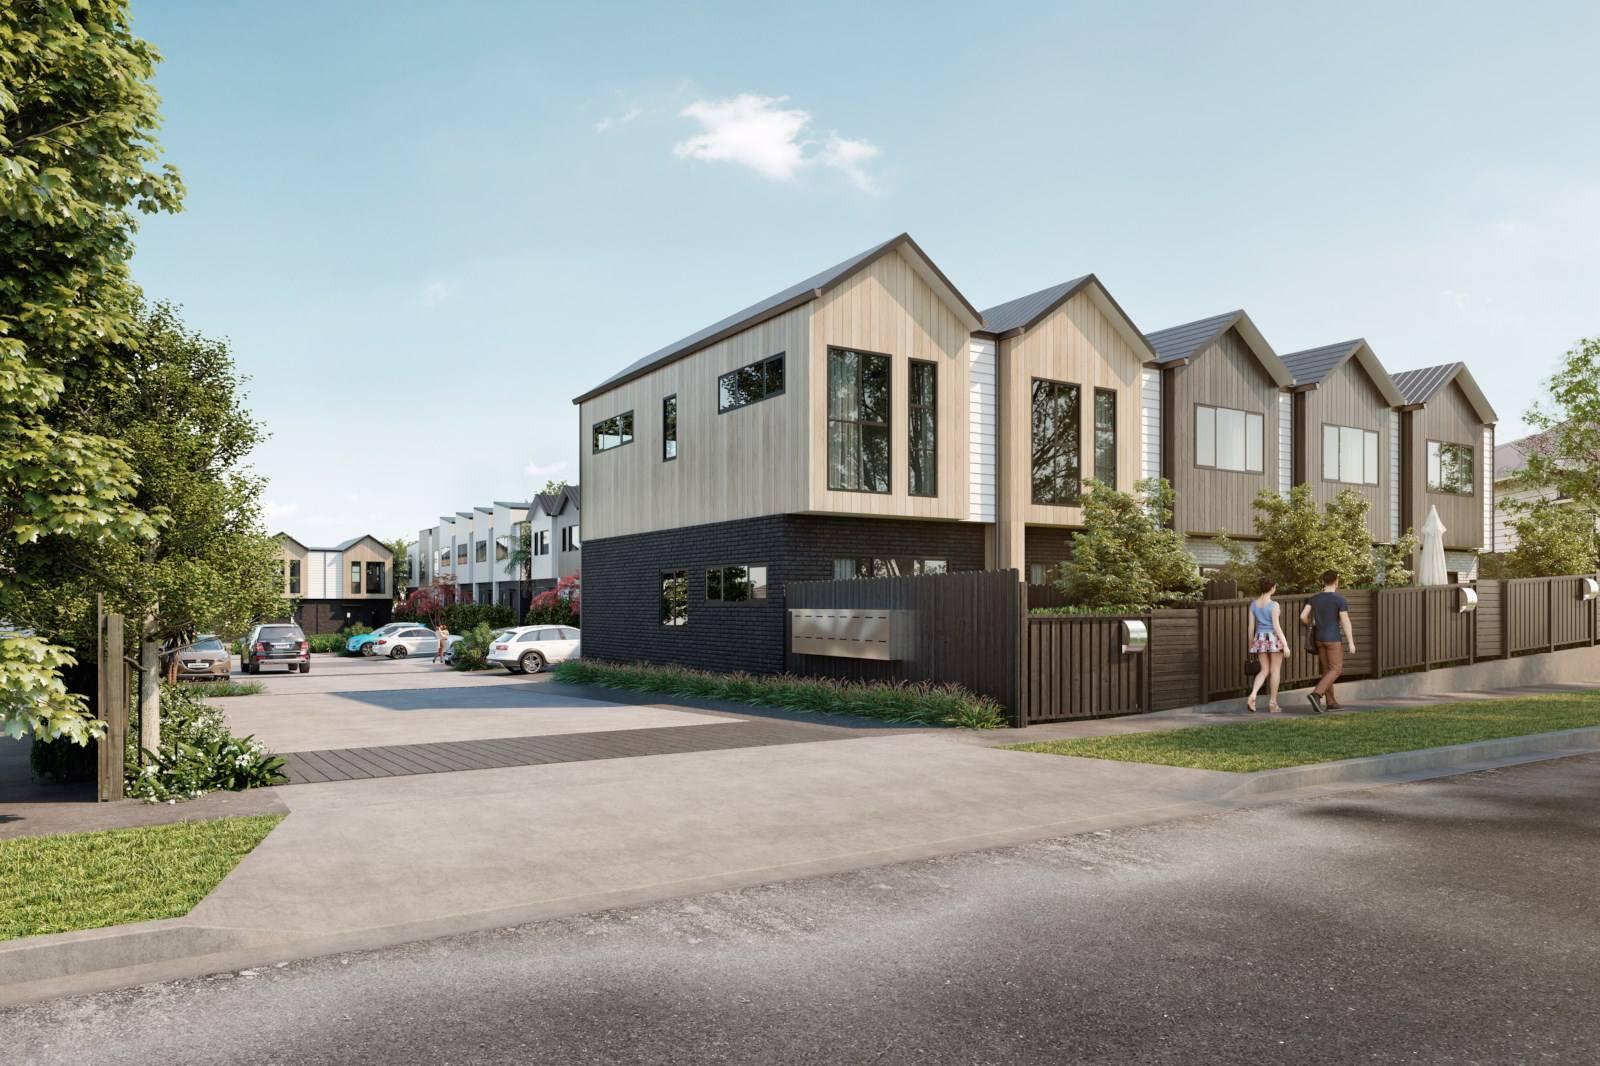 Royal Oak 2房 21套优质排房 明年竣工 带10年主建筑师质保 配套一网打尽 自住/投资均可! OAK TERRACE